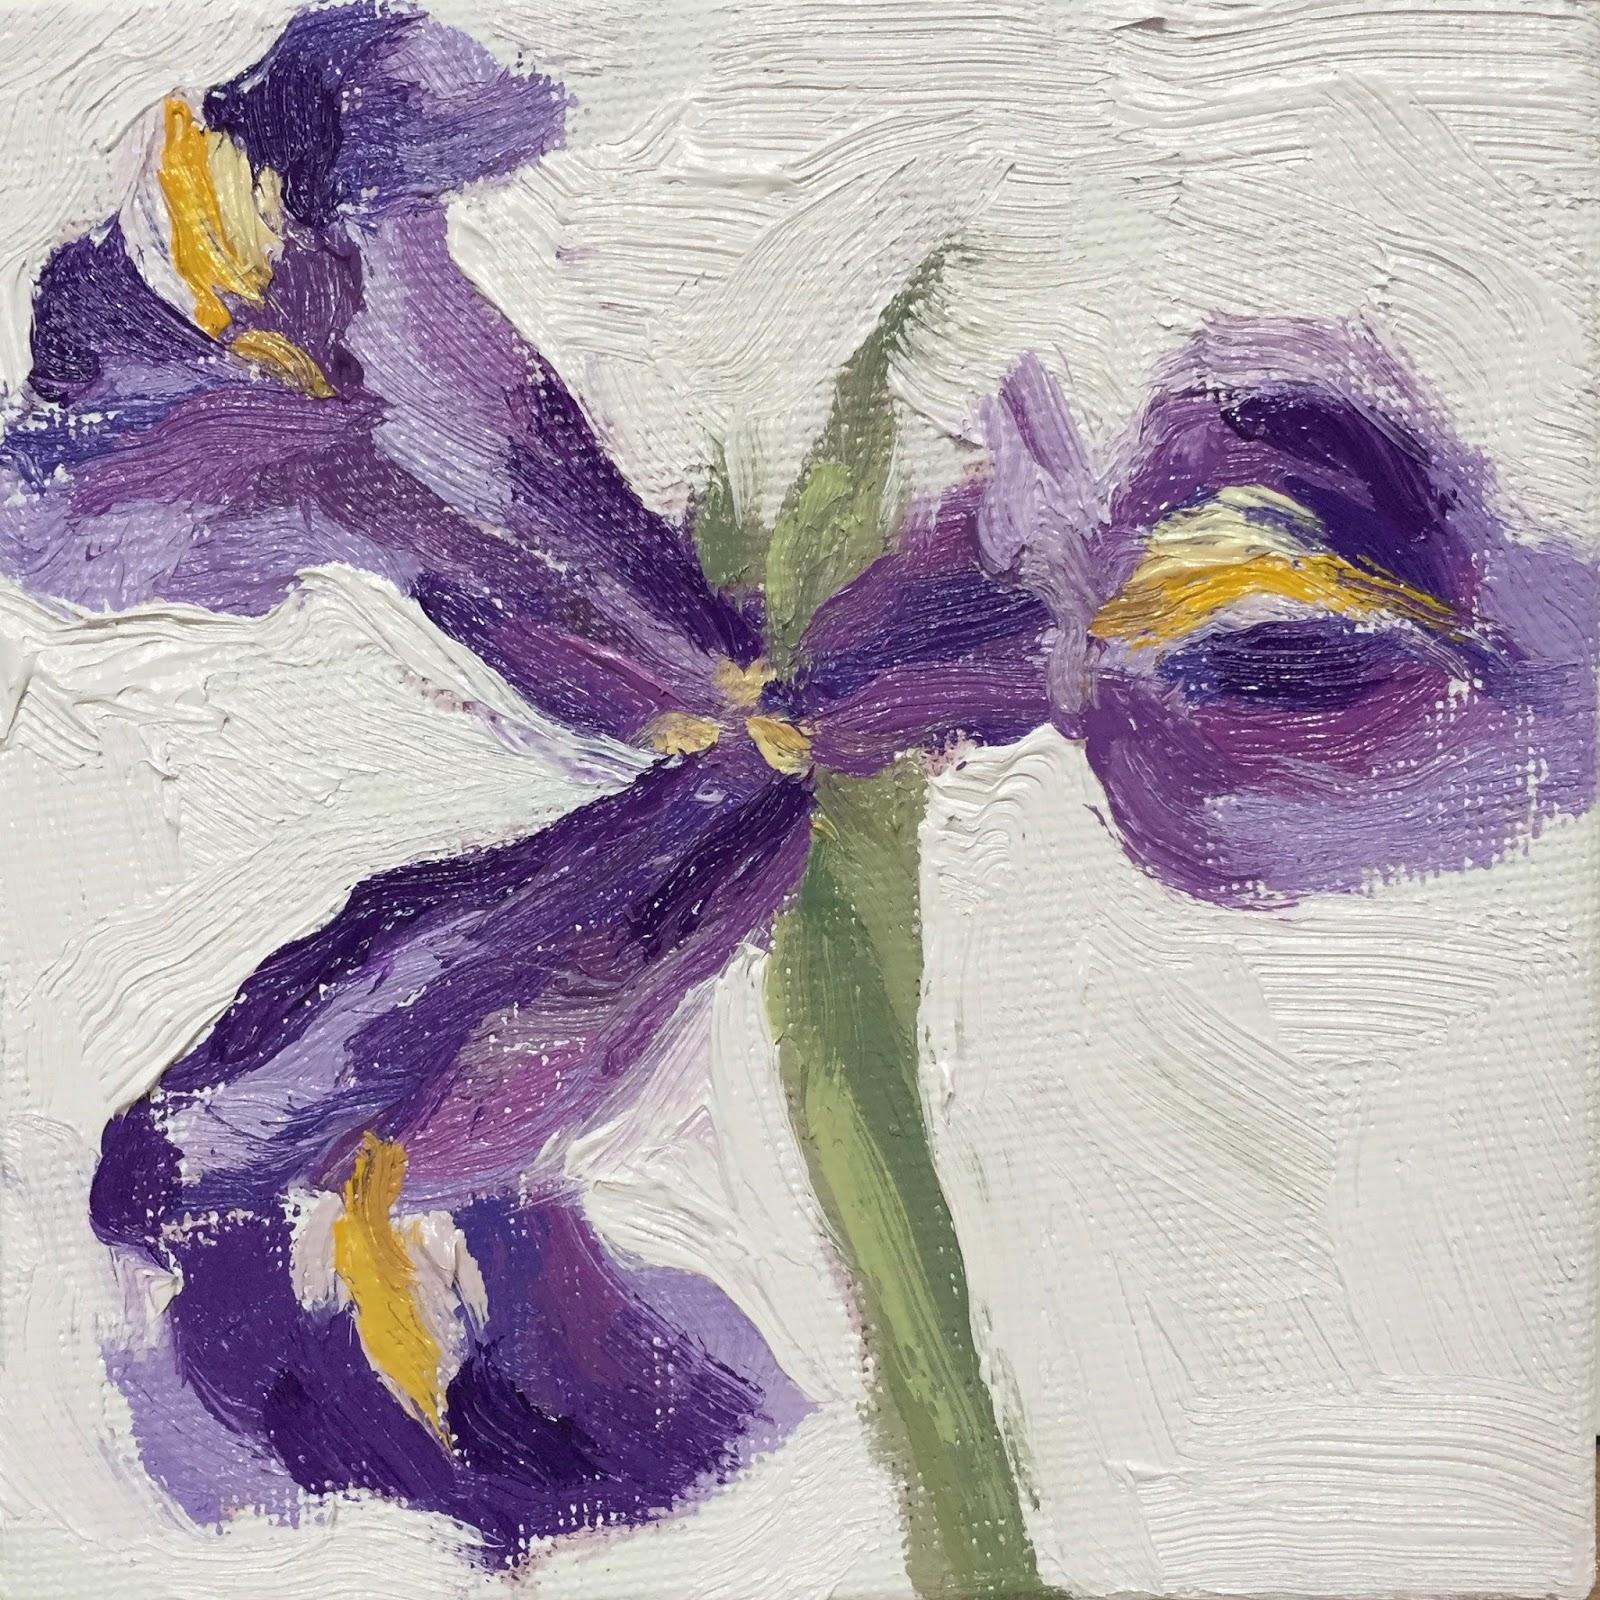 Clare Bowen Artist Daily Painting 24 Open Iris Flower 4x4